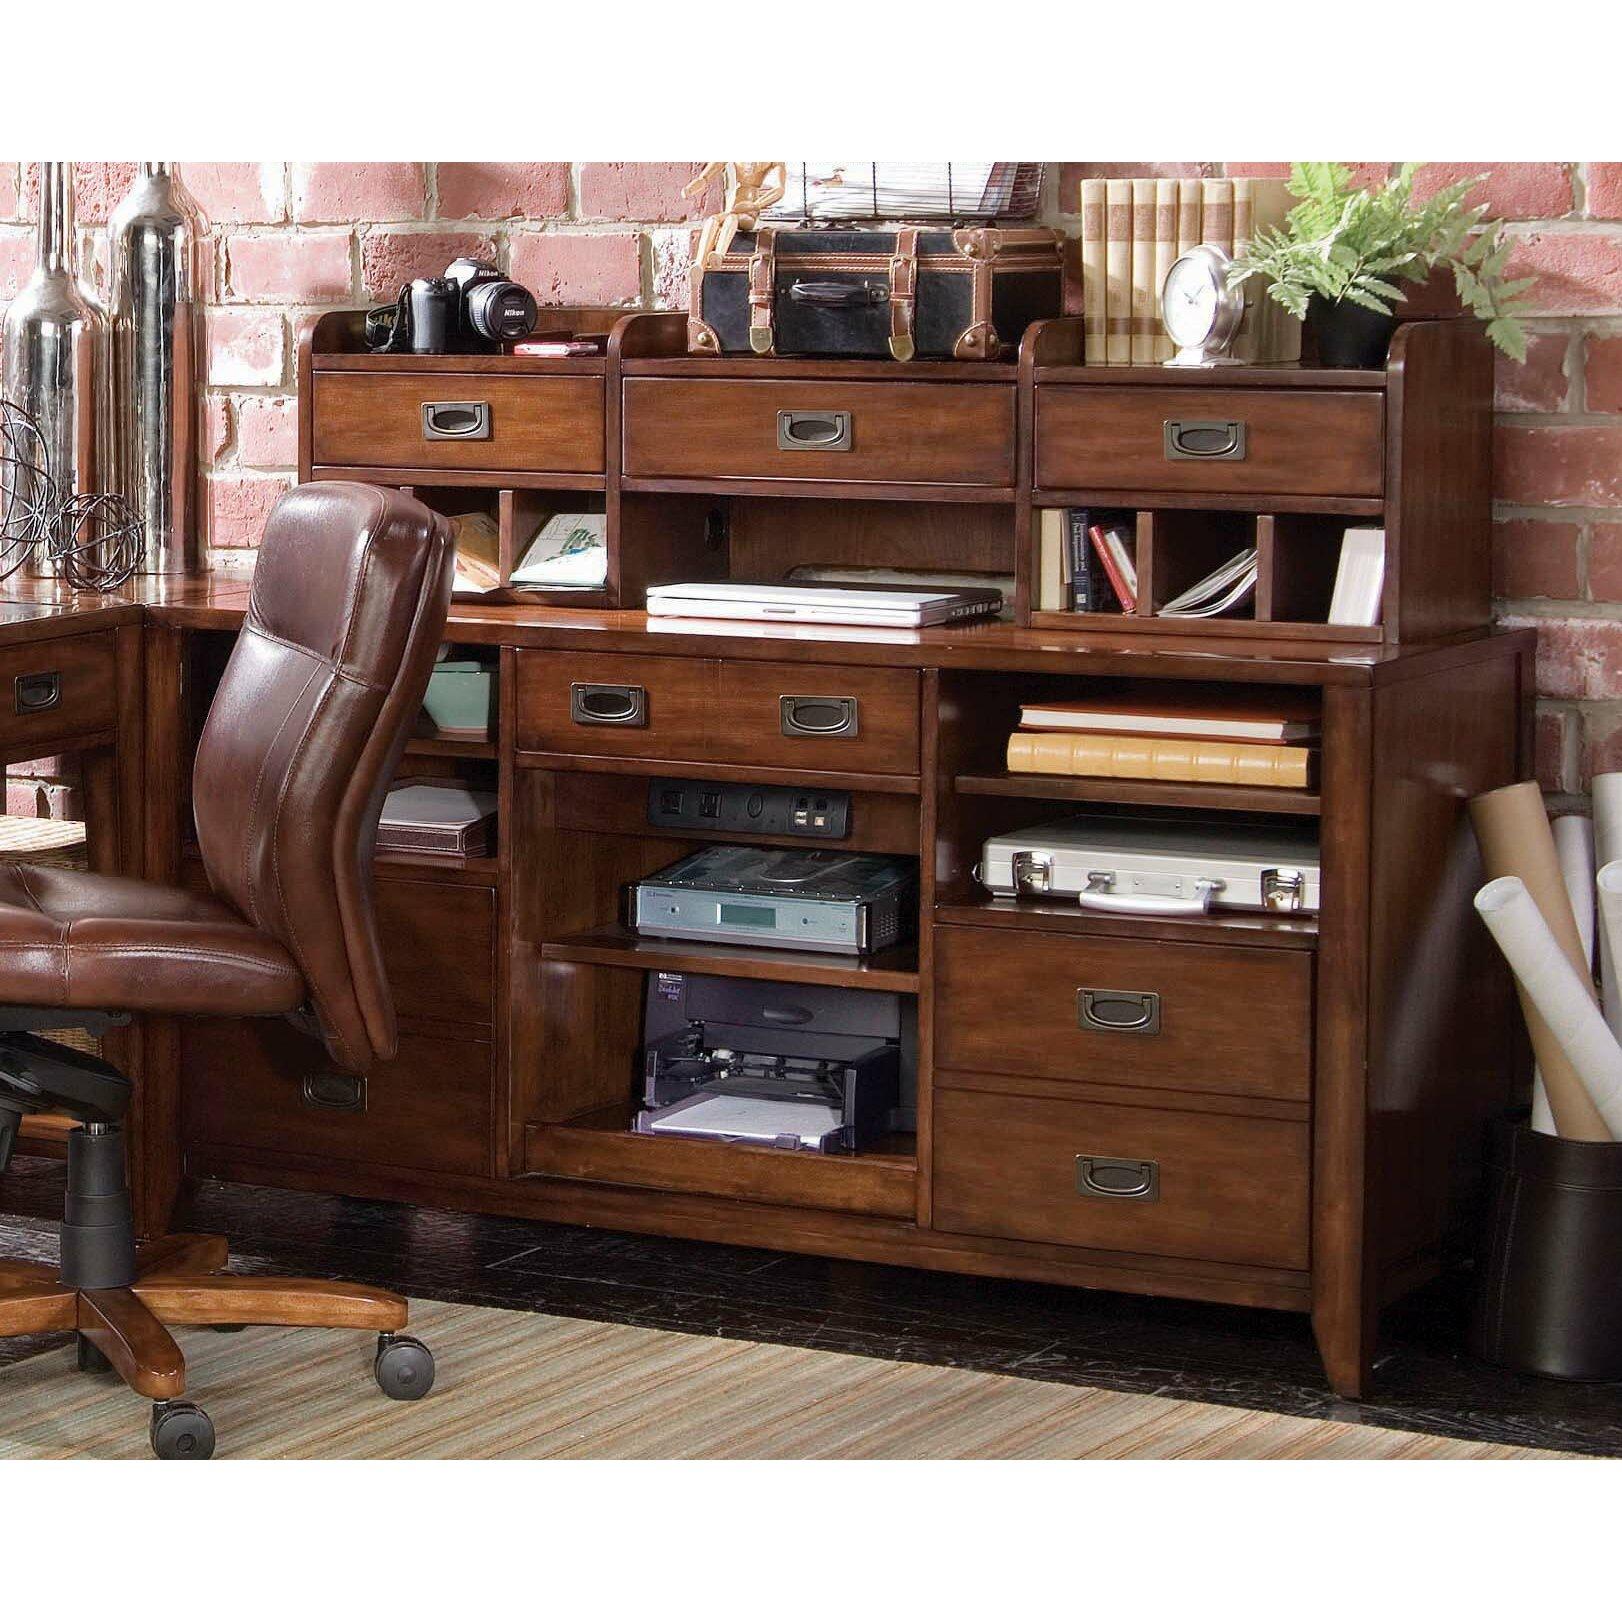 Hooker Furniture Danforth Open Credenza Reviews Wayfair